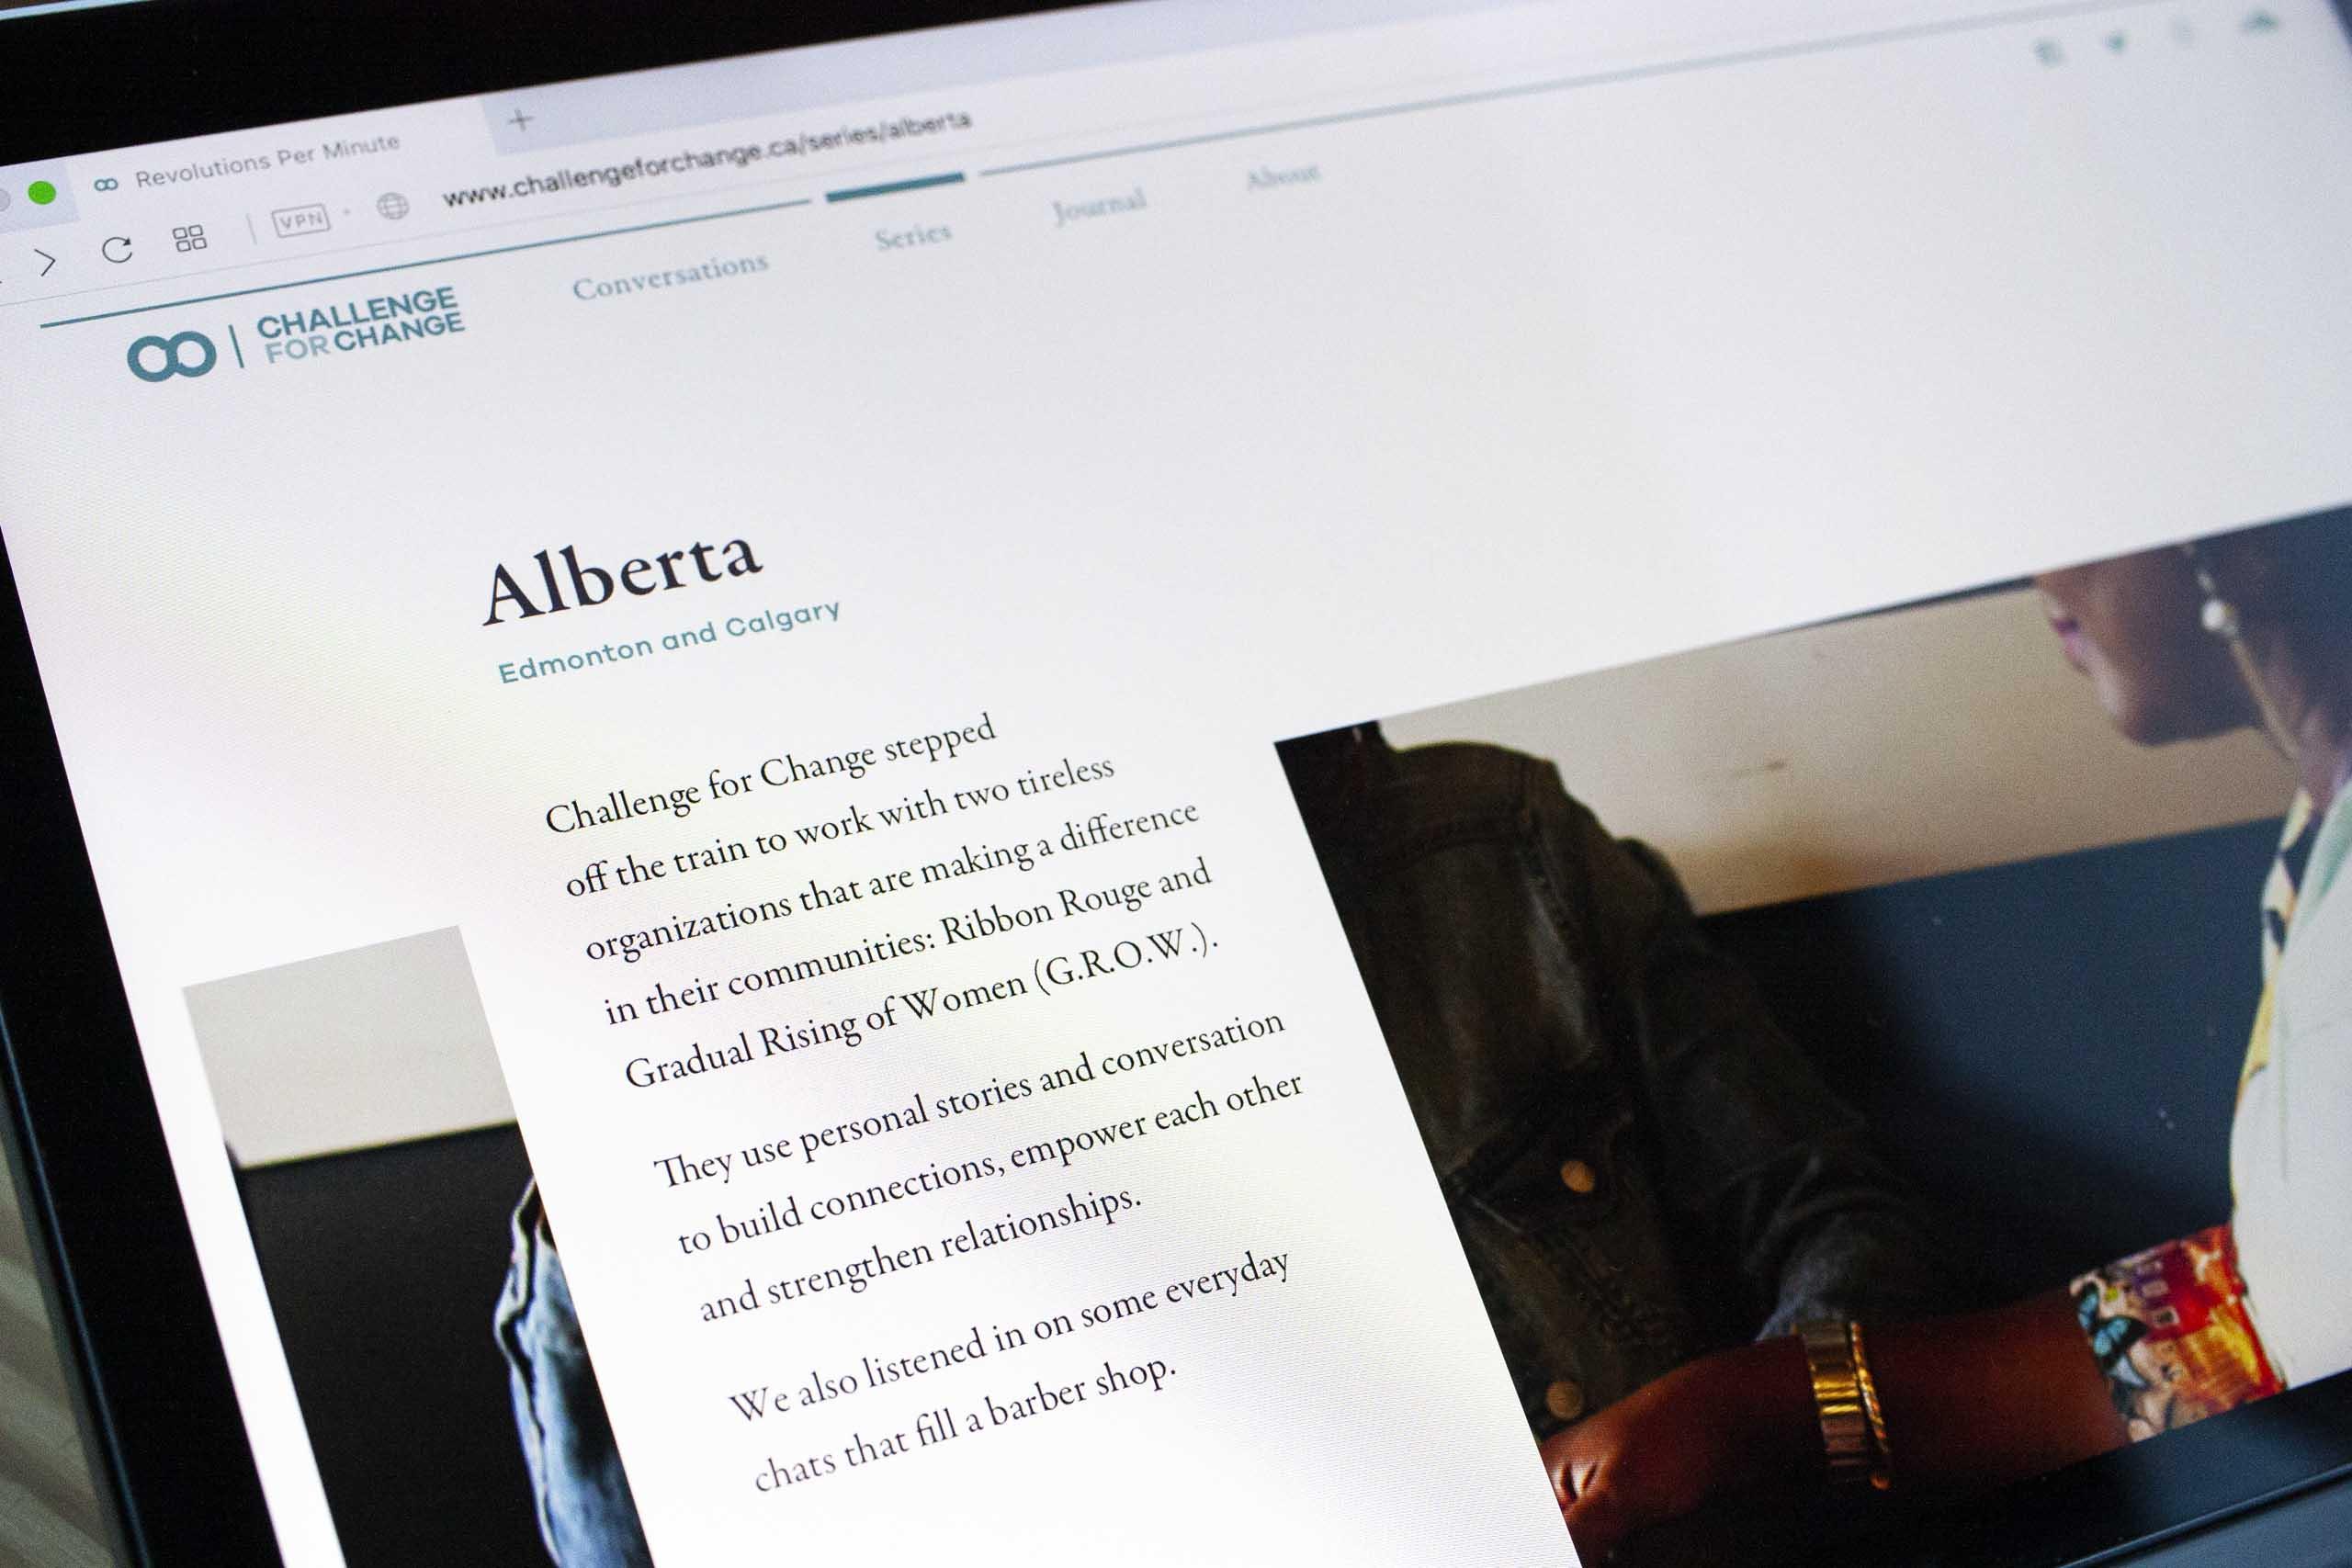 Close up photograph of the Alberta, Edmonton and Calgary series  — by Yagnyuk.